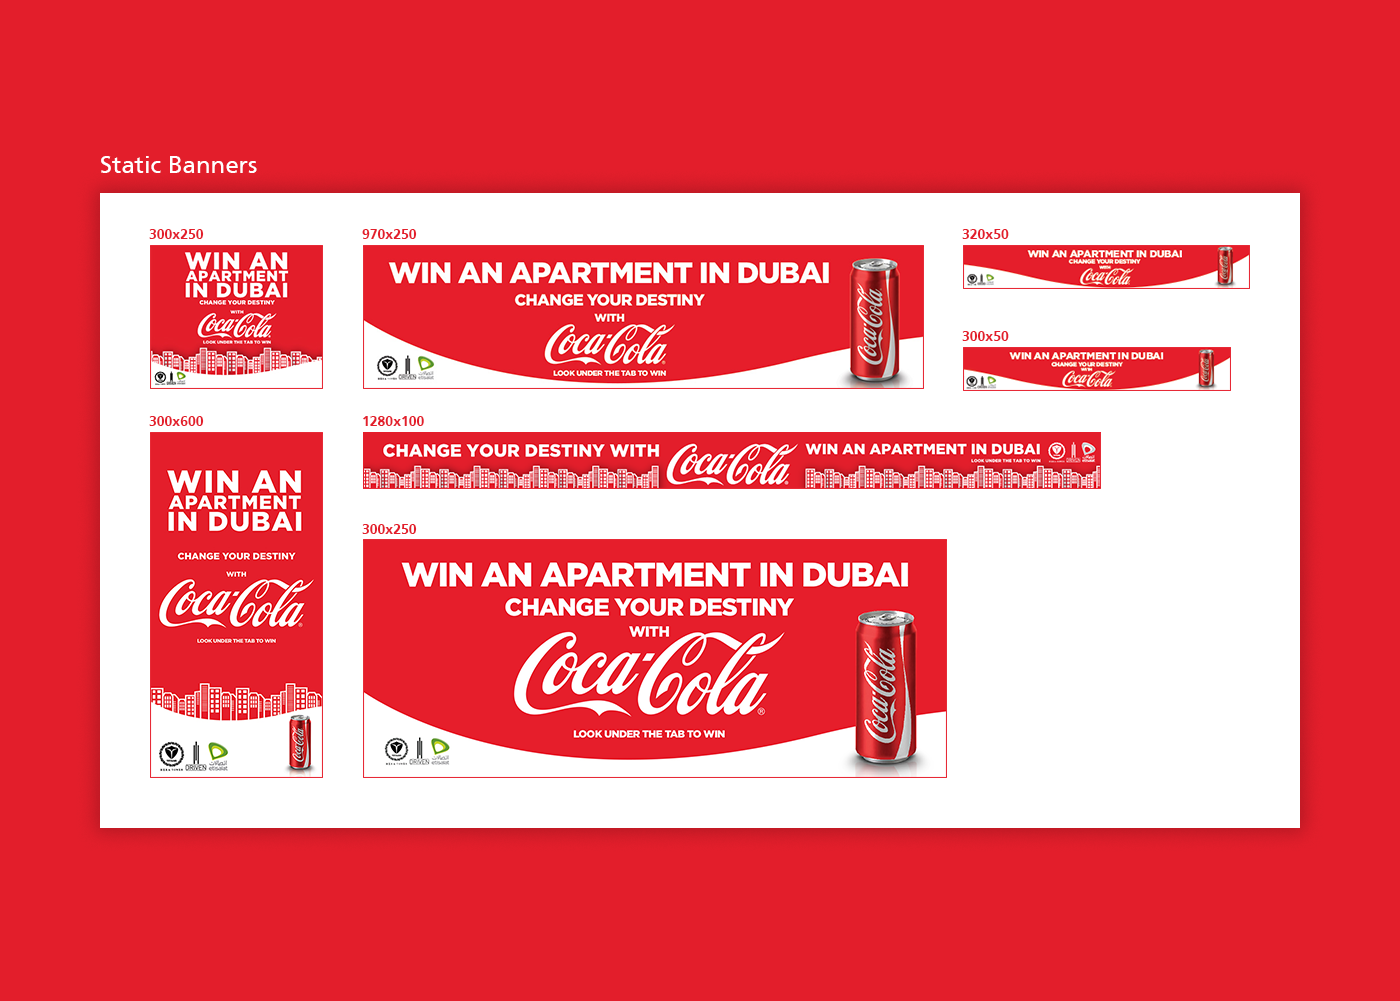 cocacola coca cola campaign Coca Cola Banner coca cola design HTML5 Banner social media campaign adwords banner cocacola wallpaper Interaction design  motion graphics